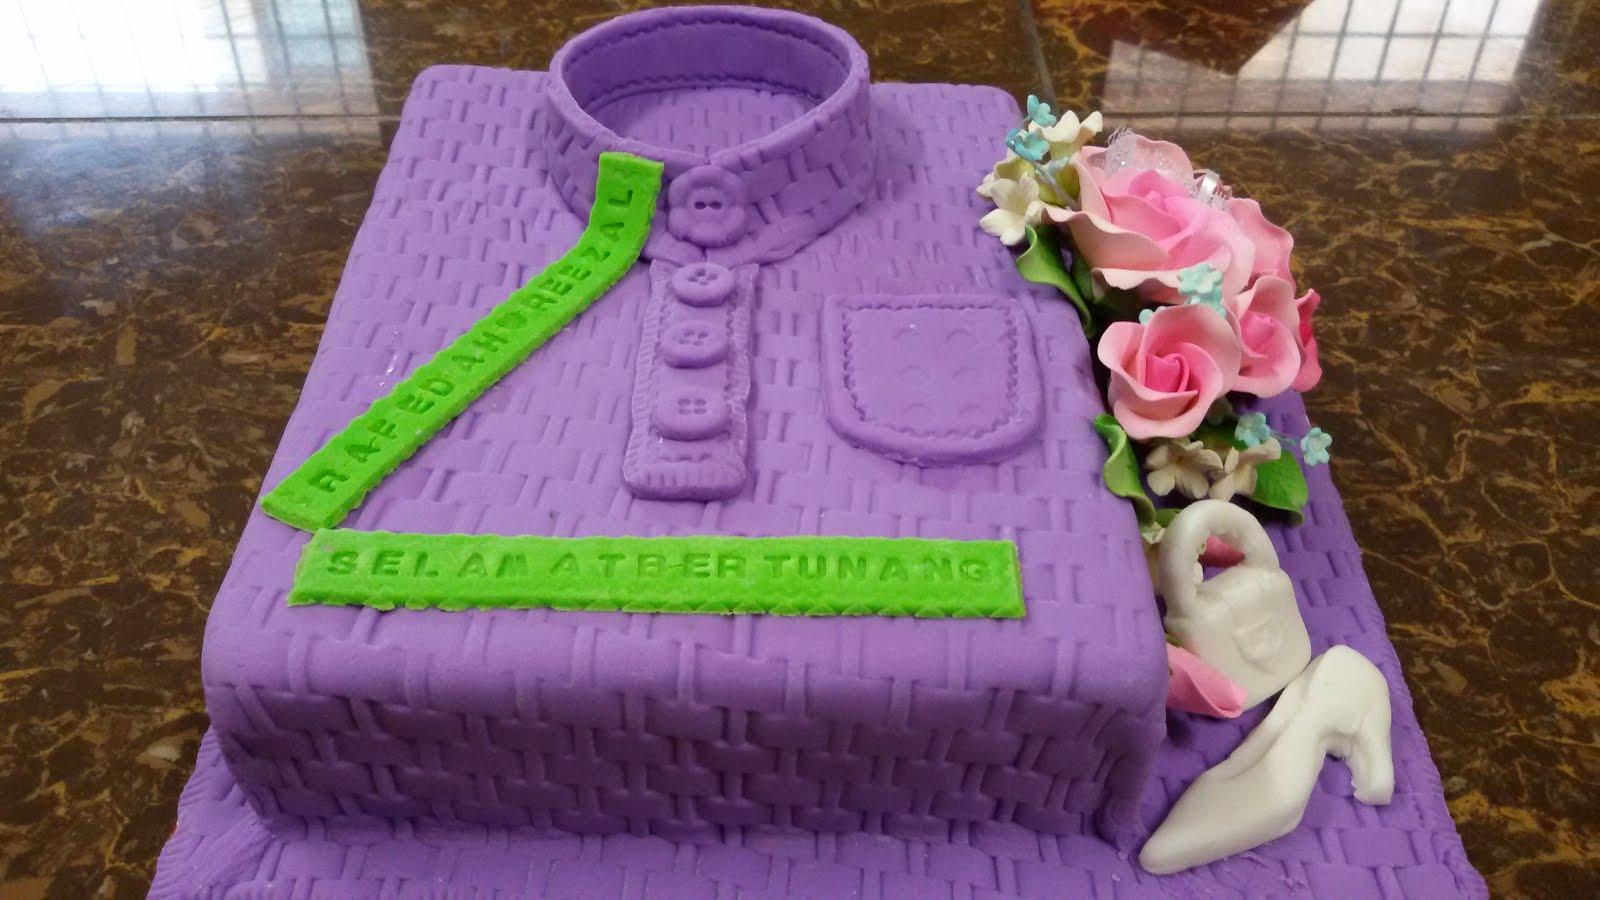 baju melayu-engagement cake